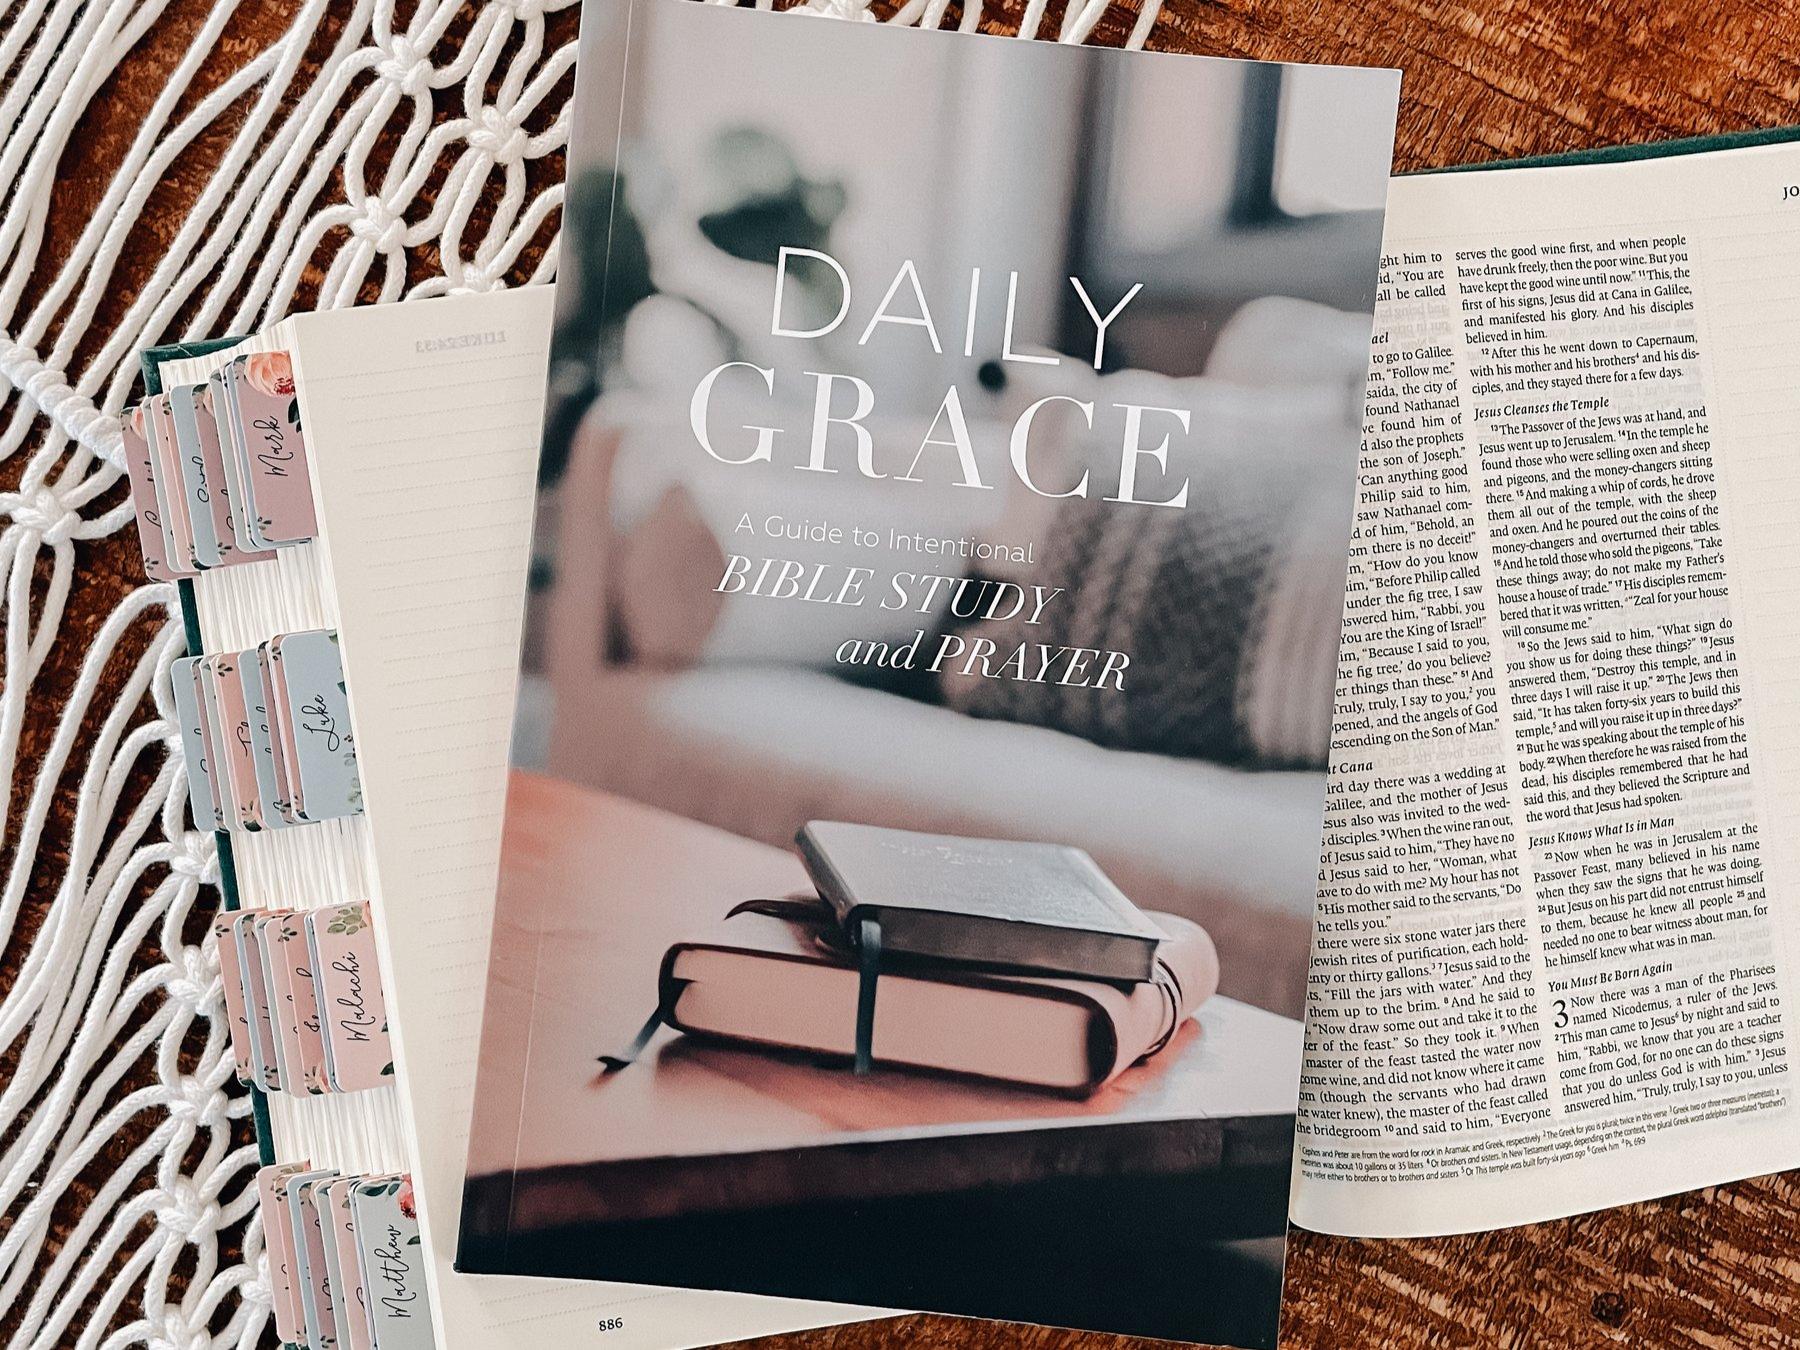 Daily Grace Co Bible Study